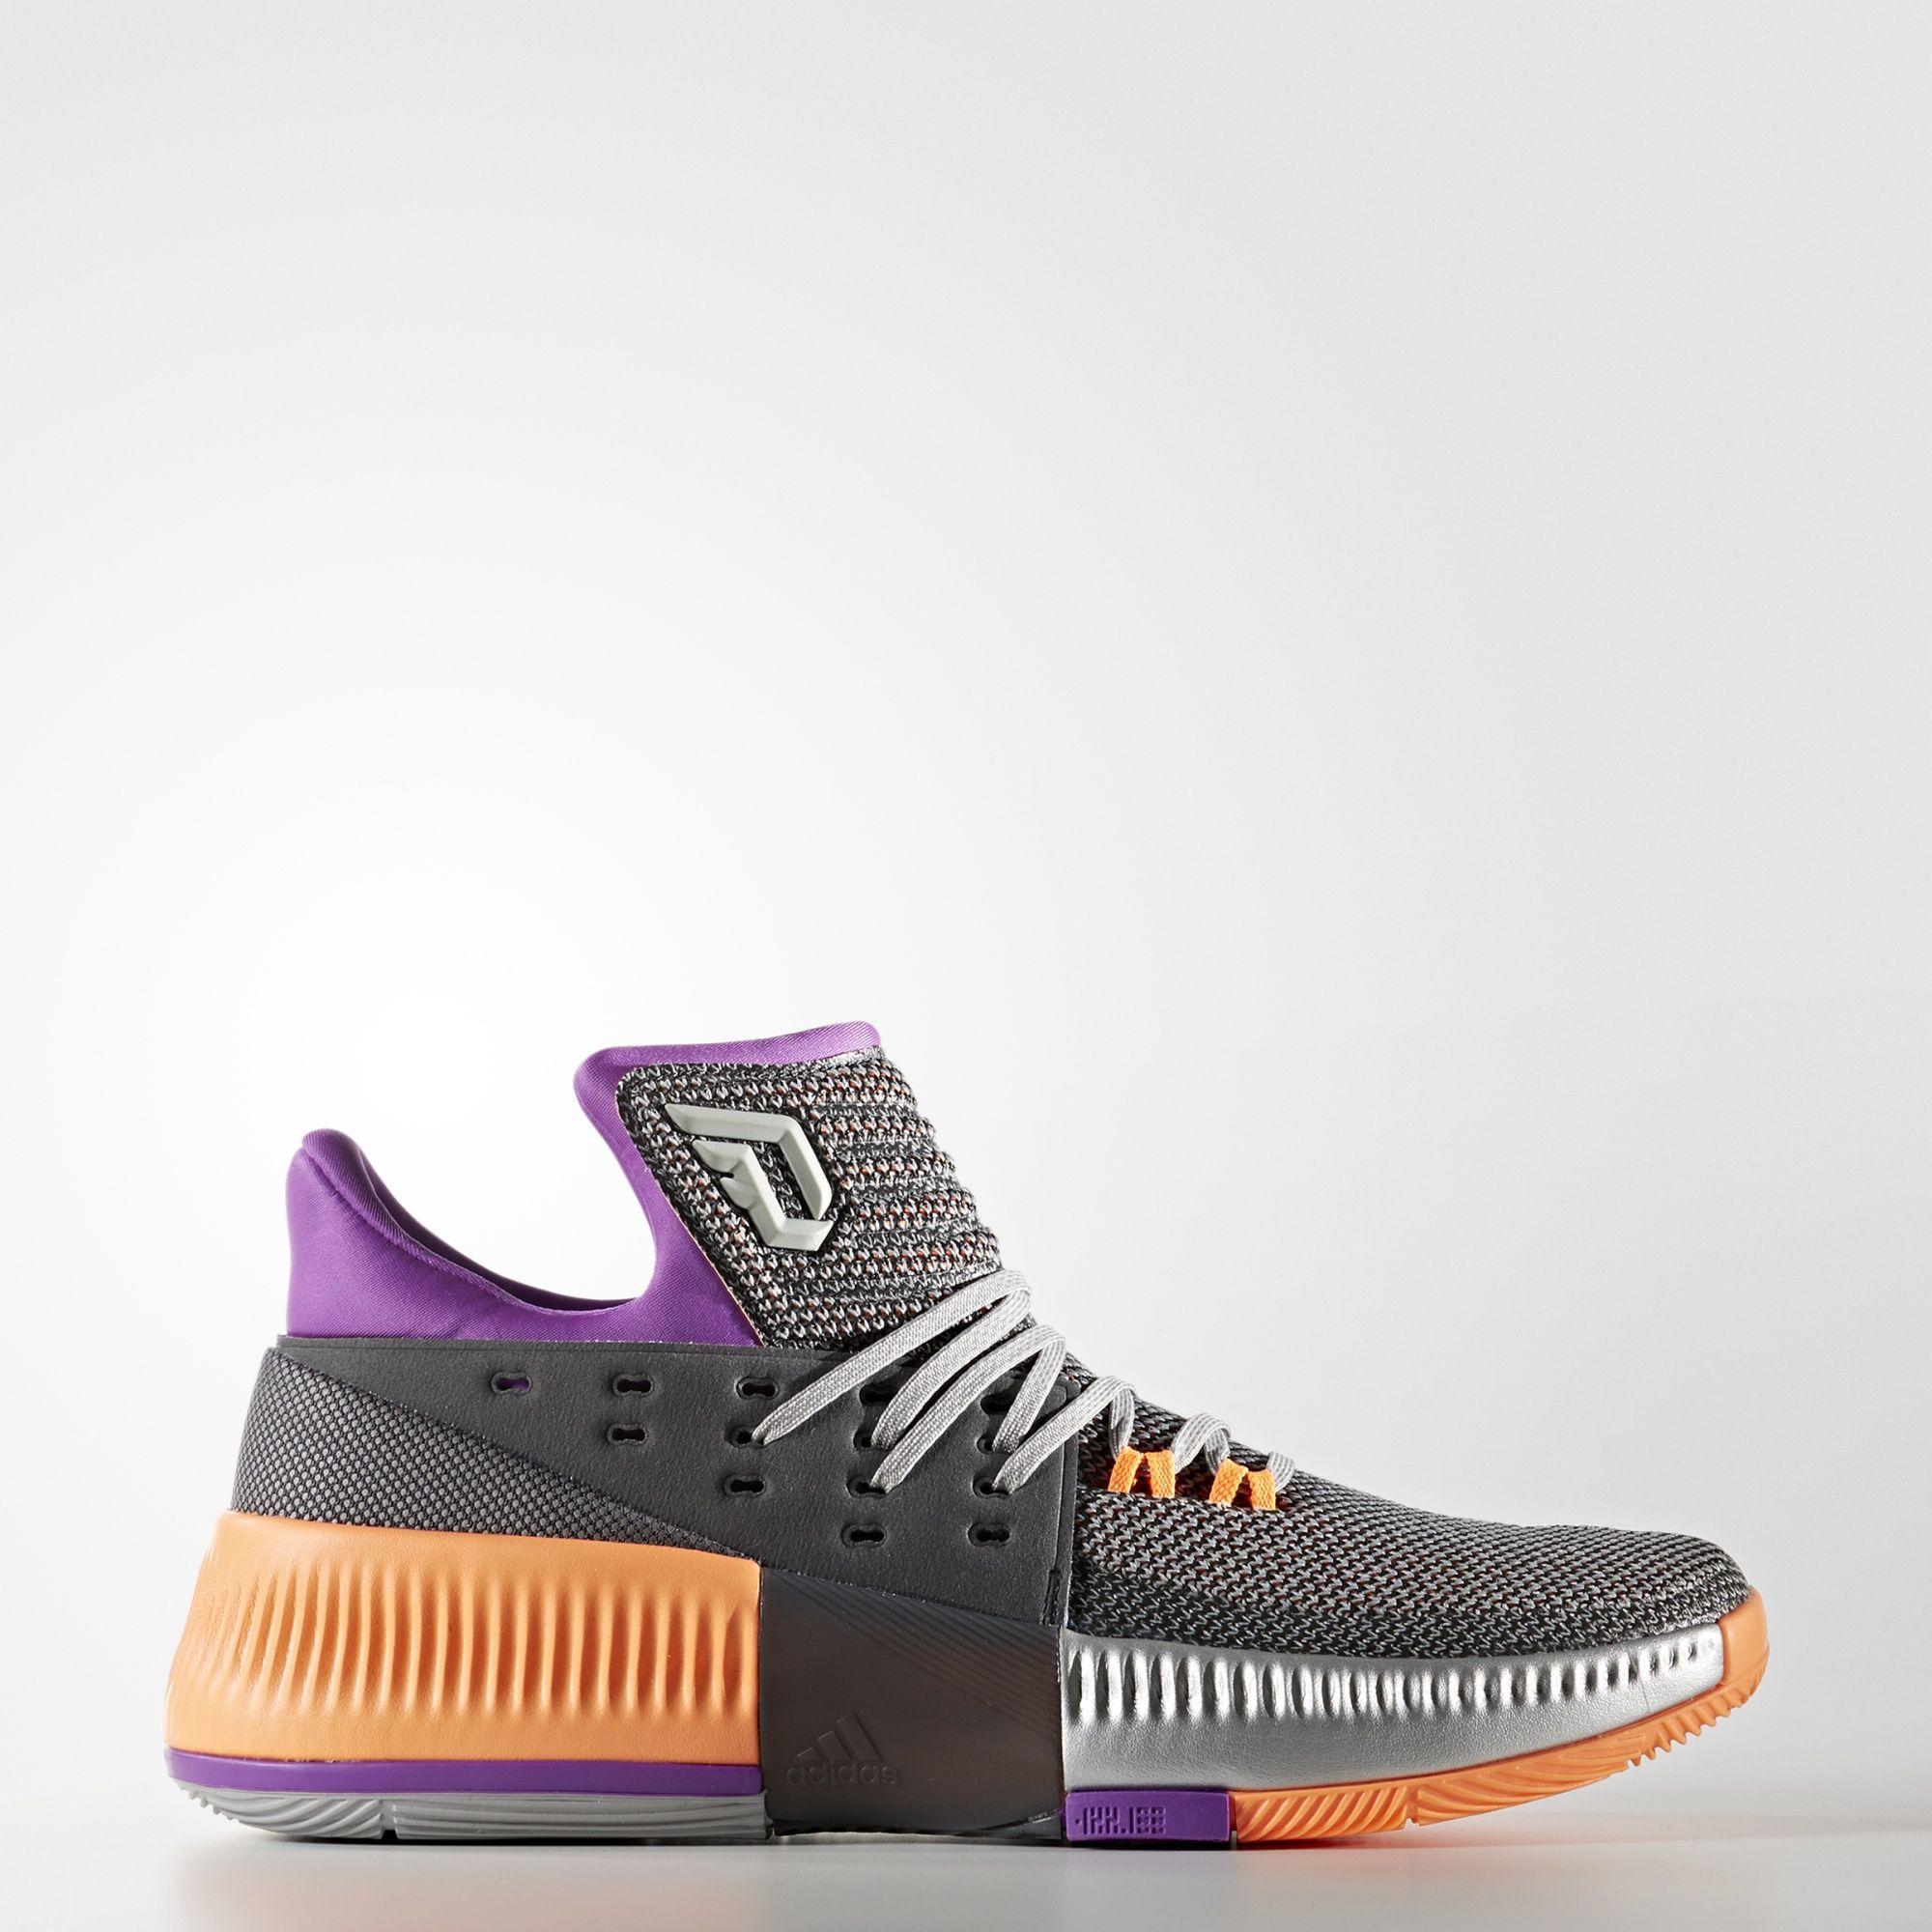 buy online 7b1ac 71e21 ... australia orange uk official online shop adidas dame 3 all star 1 2d49b  4c0ba